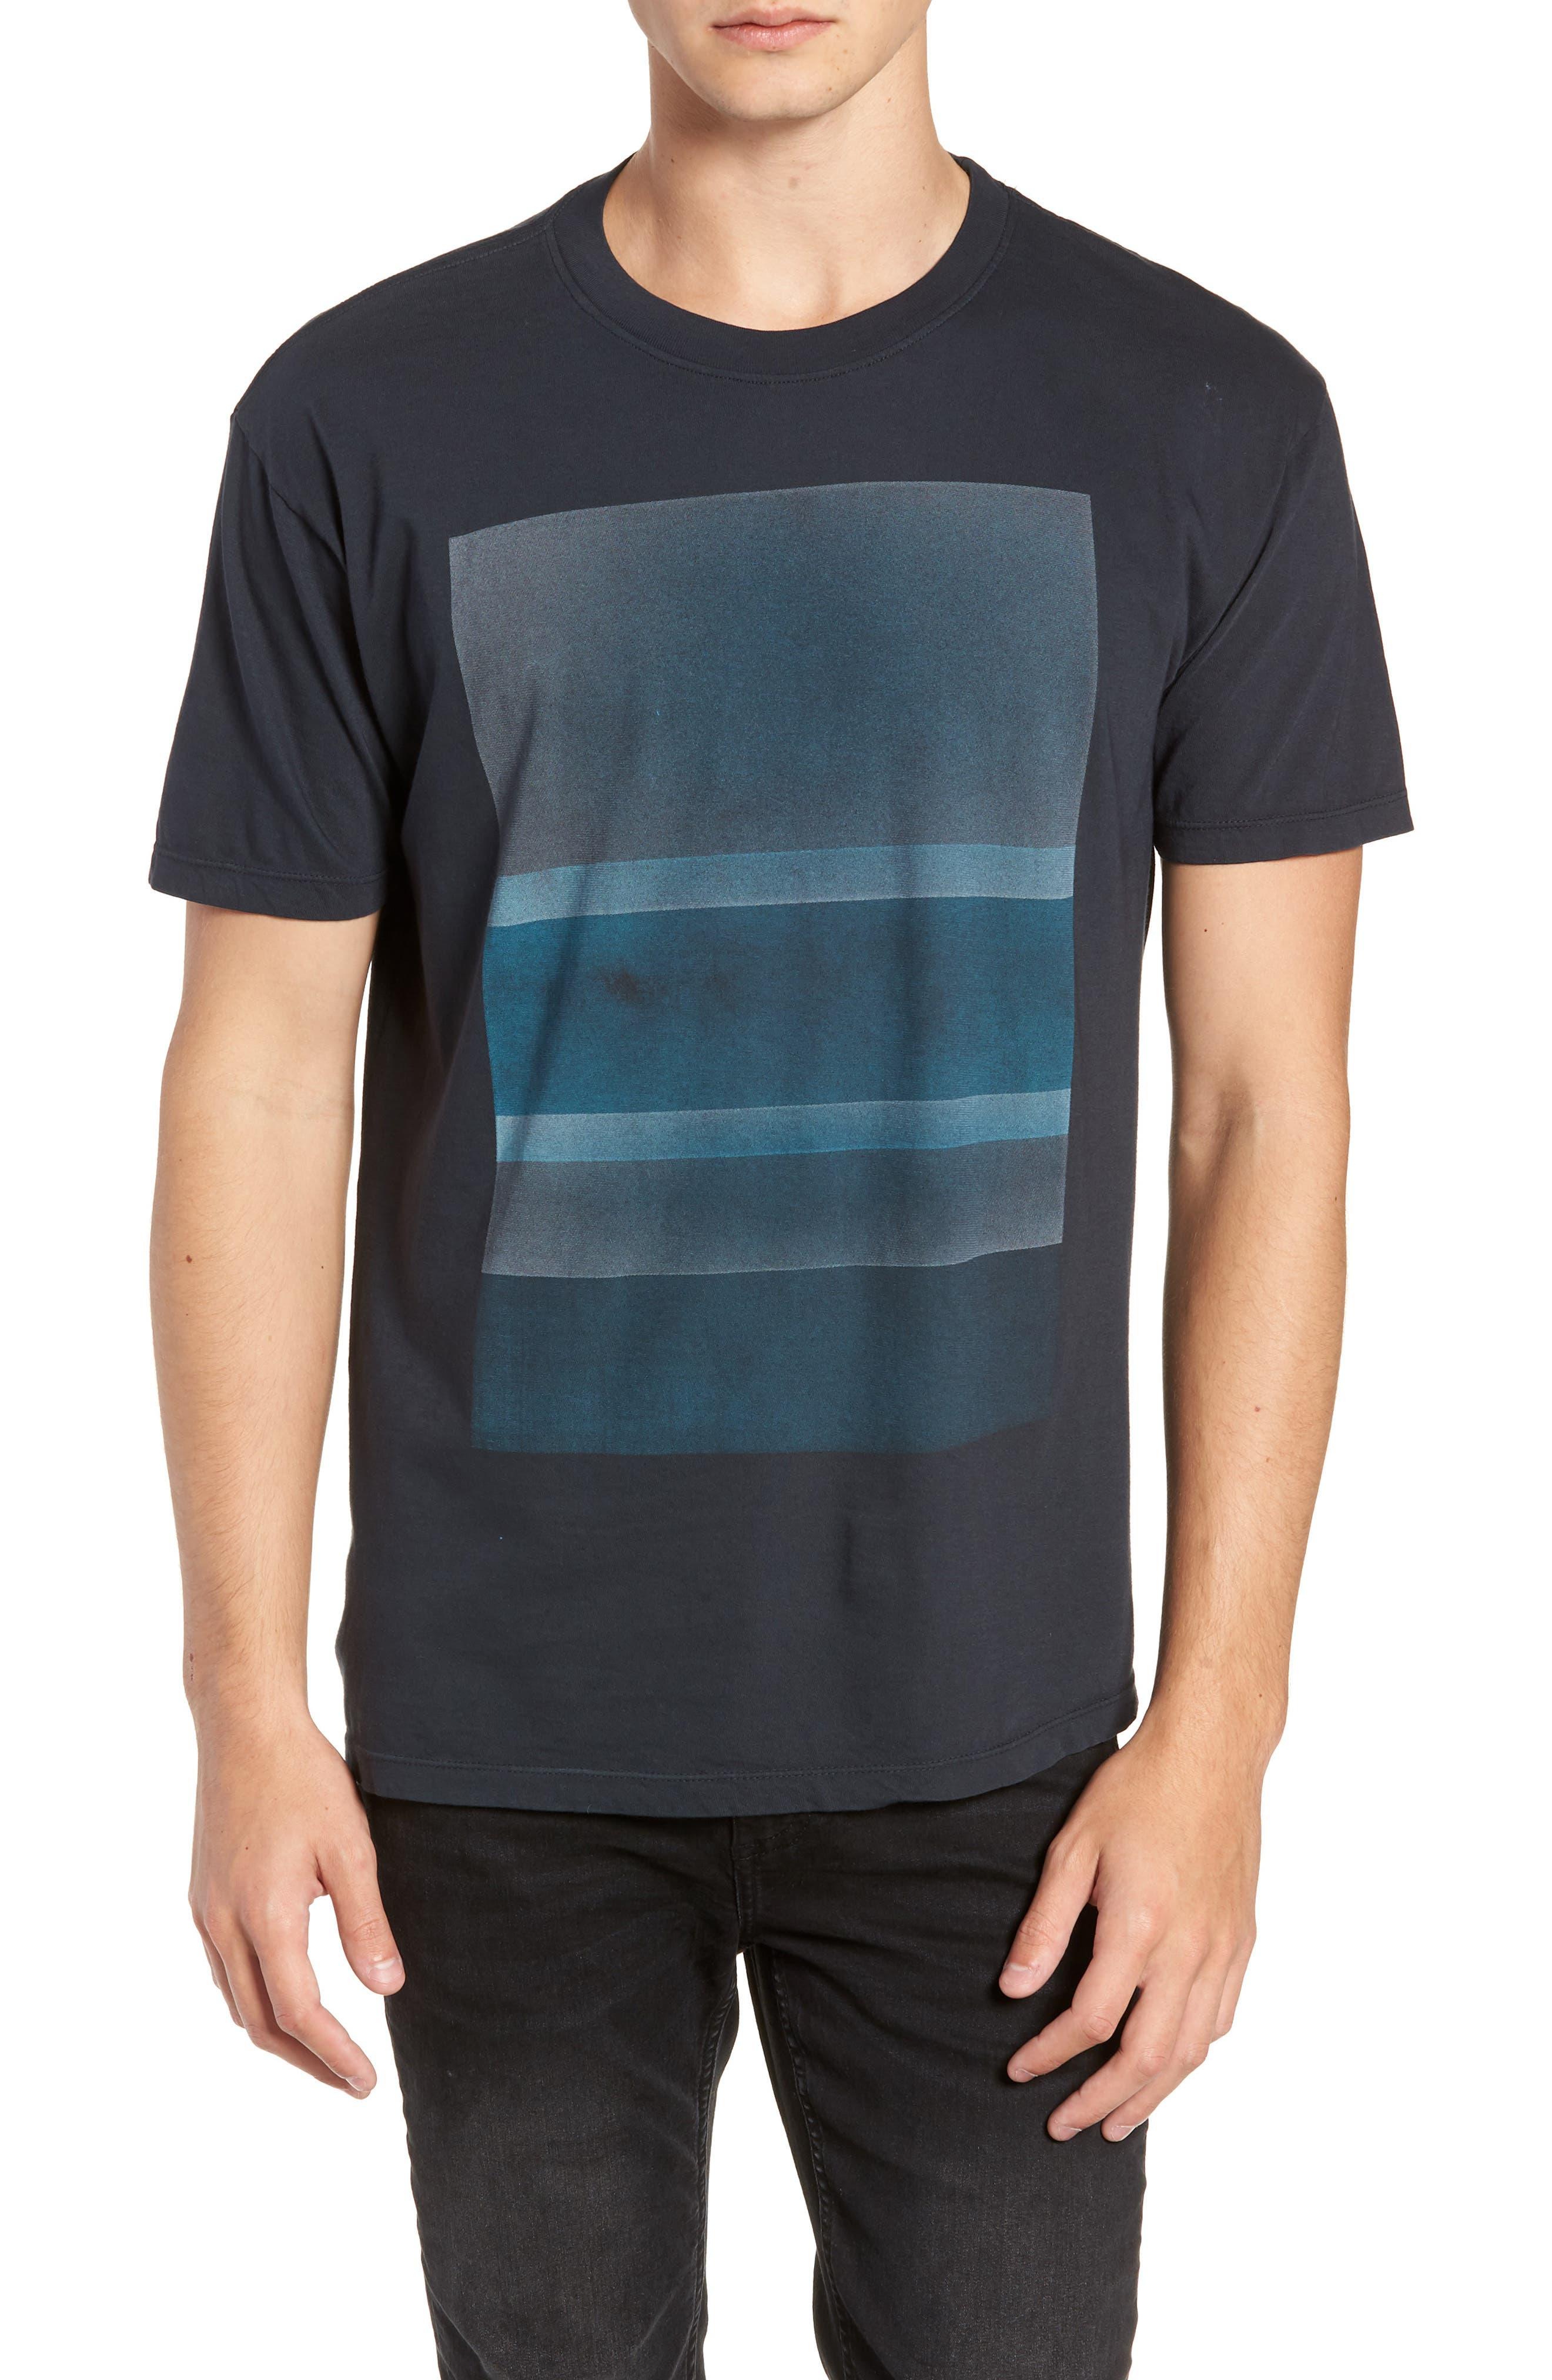 VESTIGE Motion Graphic T-Shirt in Black